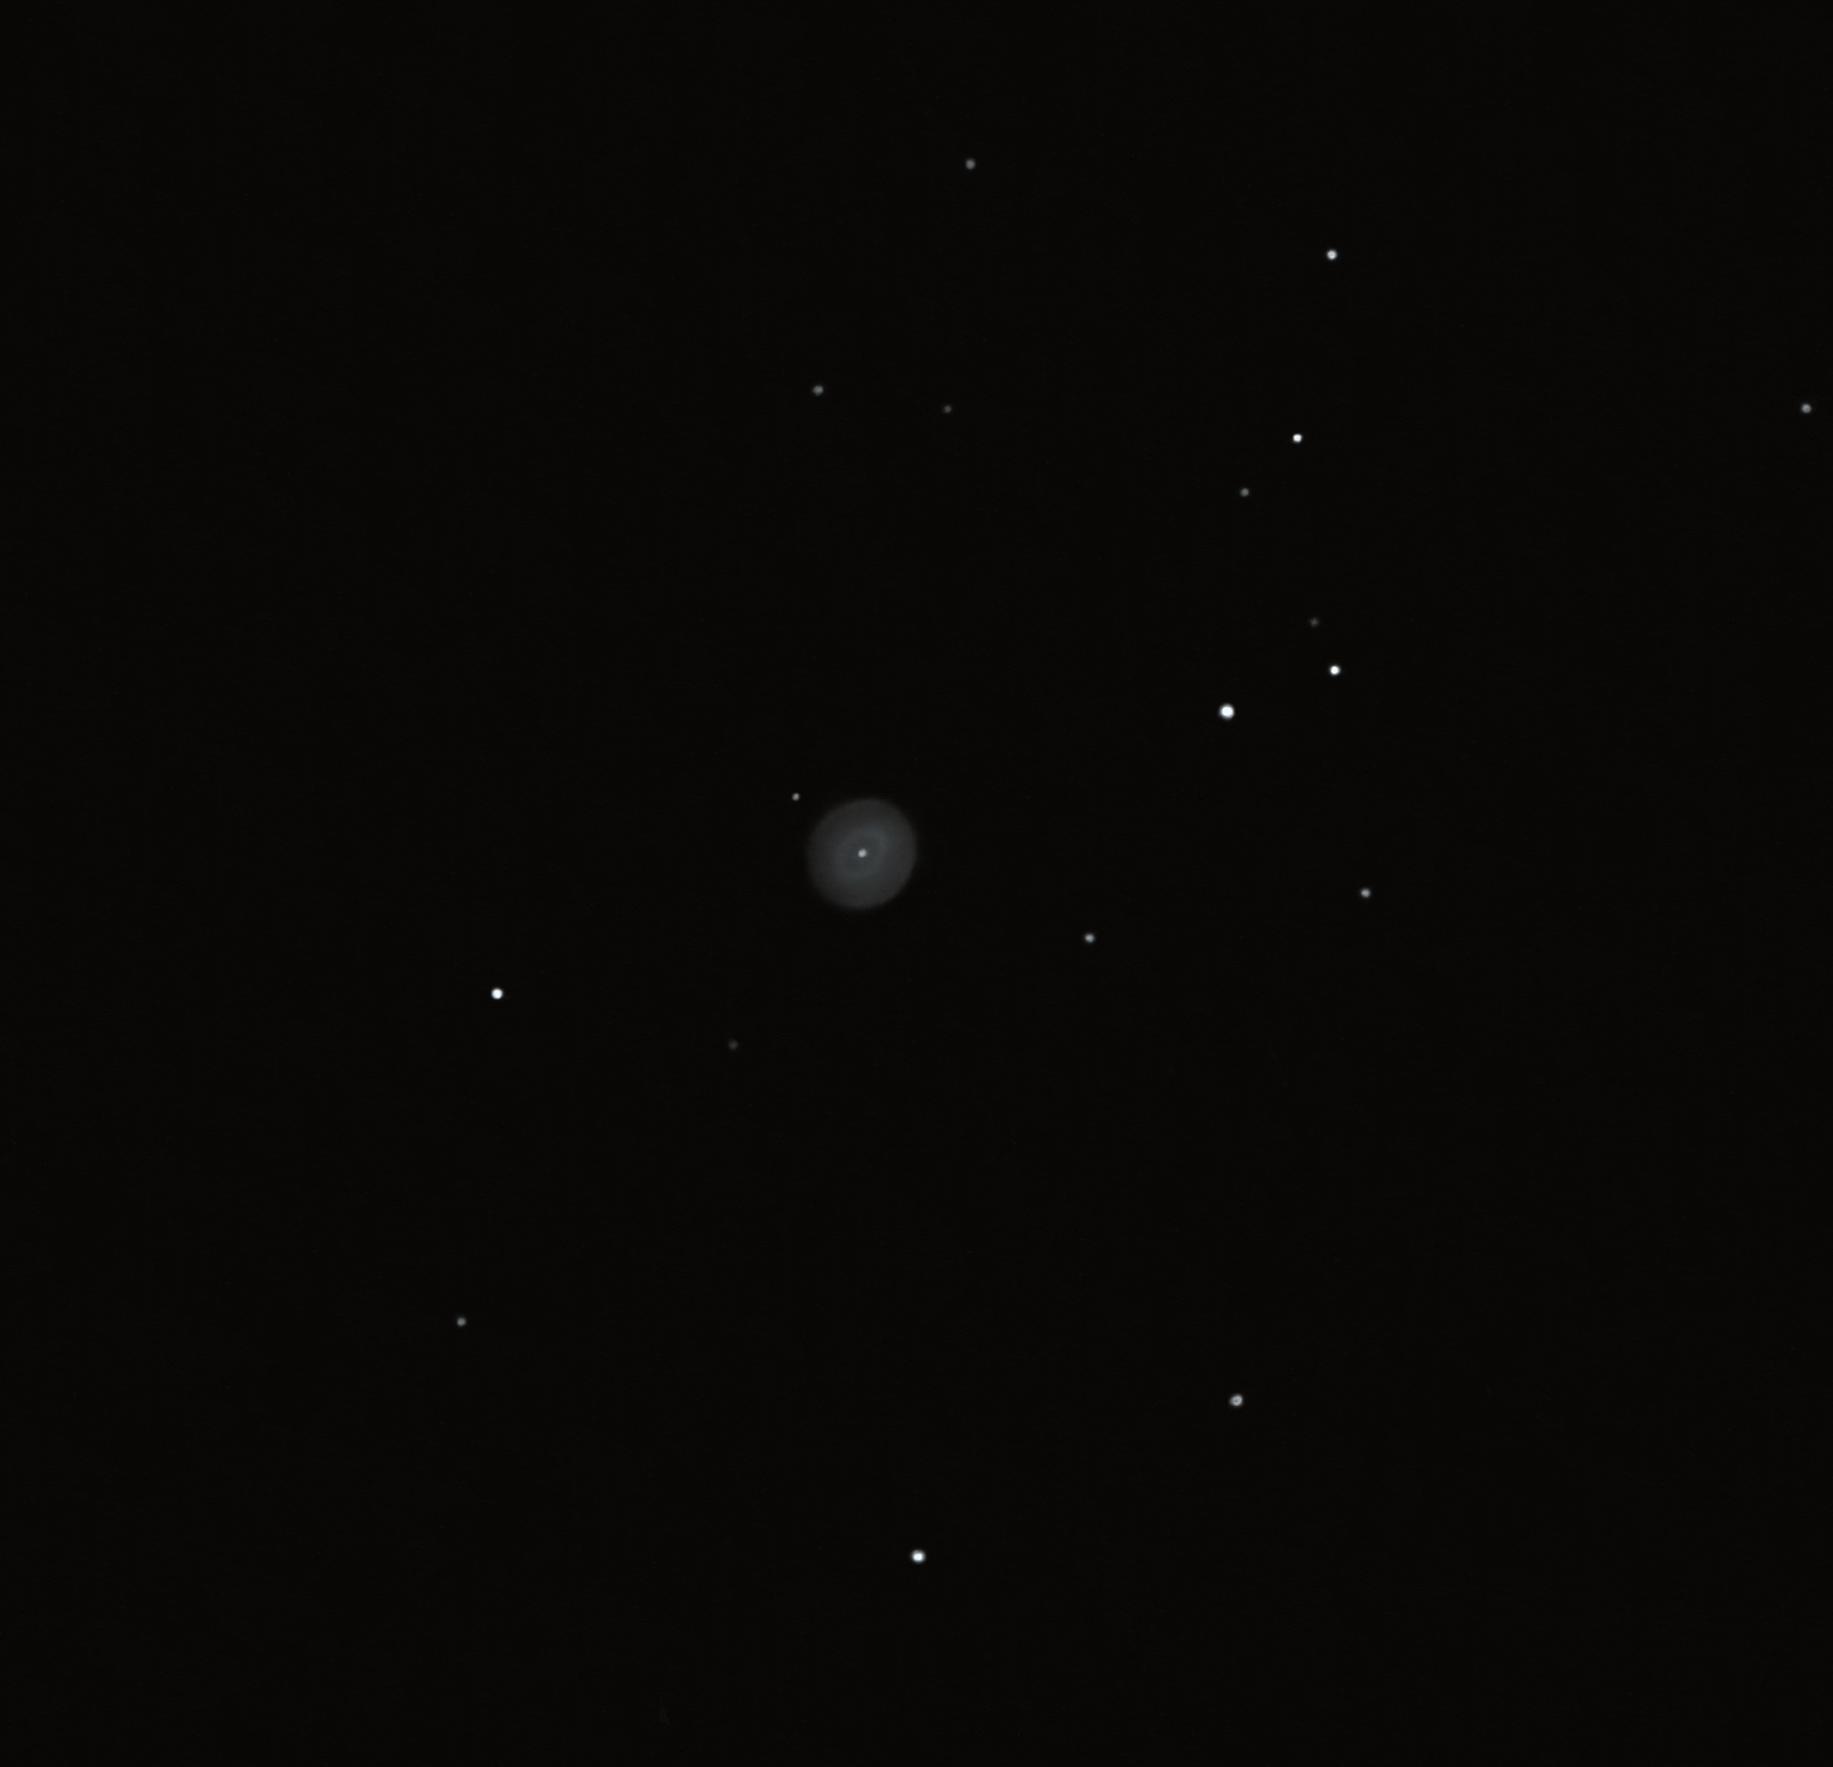 ngc 6891 planetary nebula